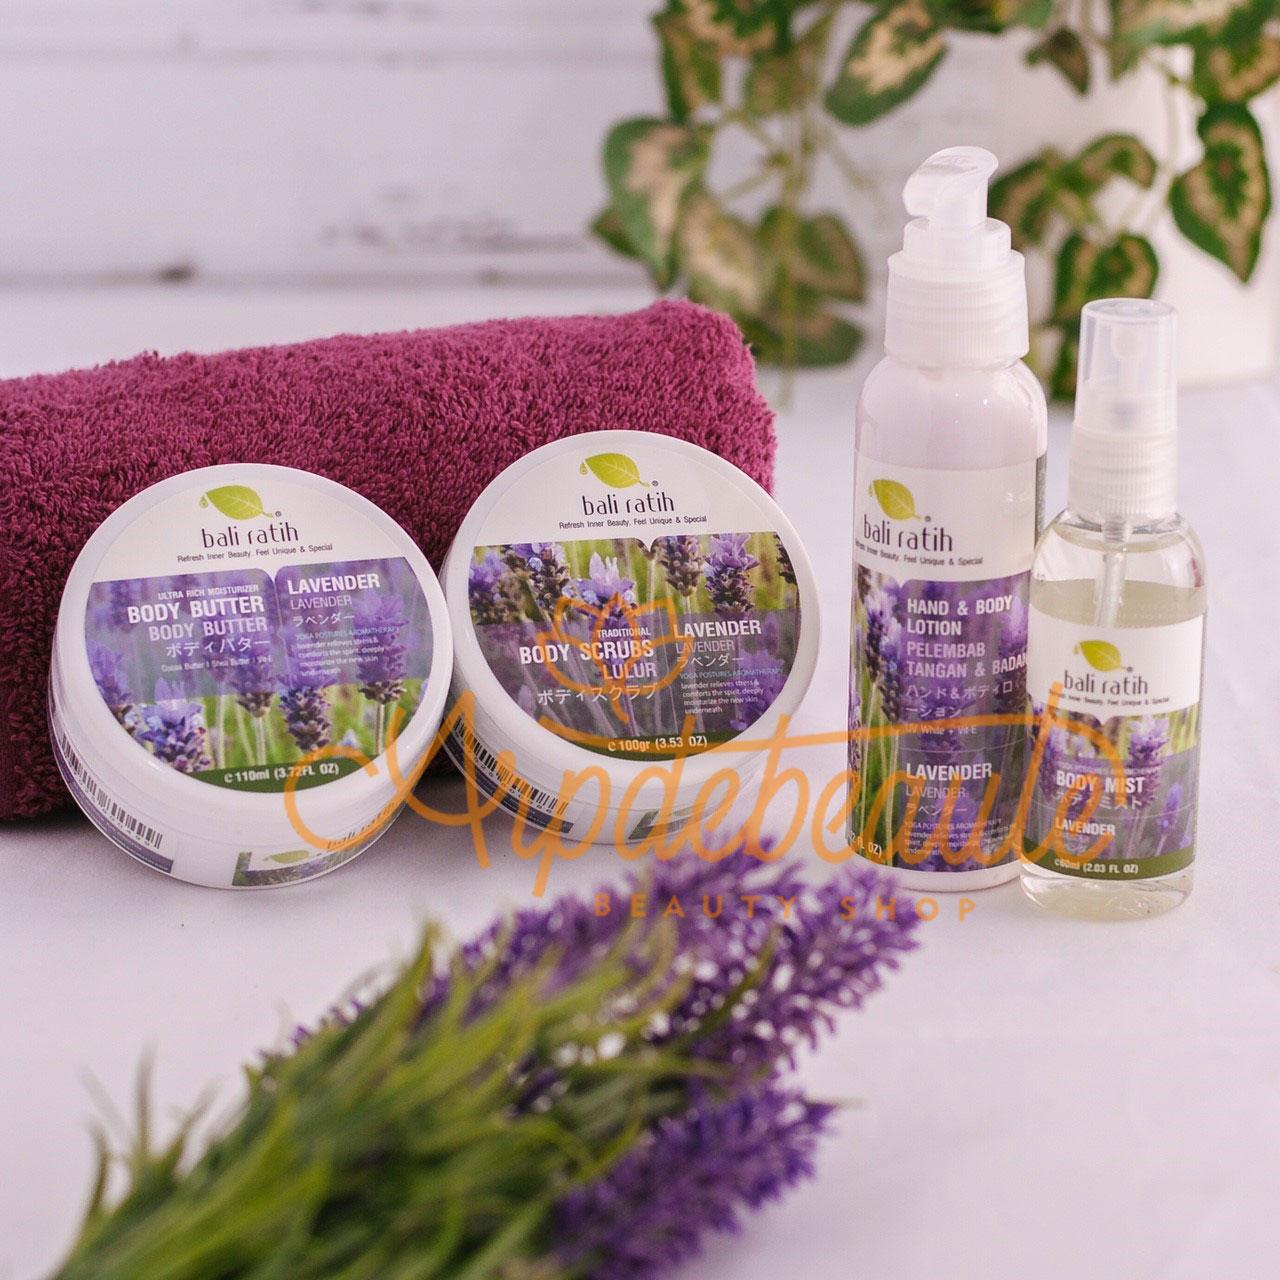 Bali Ratih Body Scrub 110ml Lavender Daftar Harga Terlengkap Indonesia Butter Sekar Jagat Paket Cantik